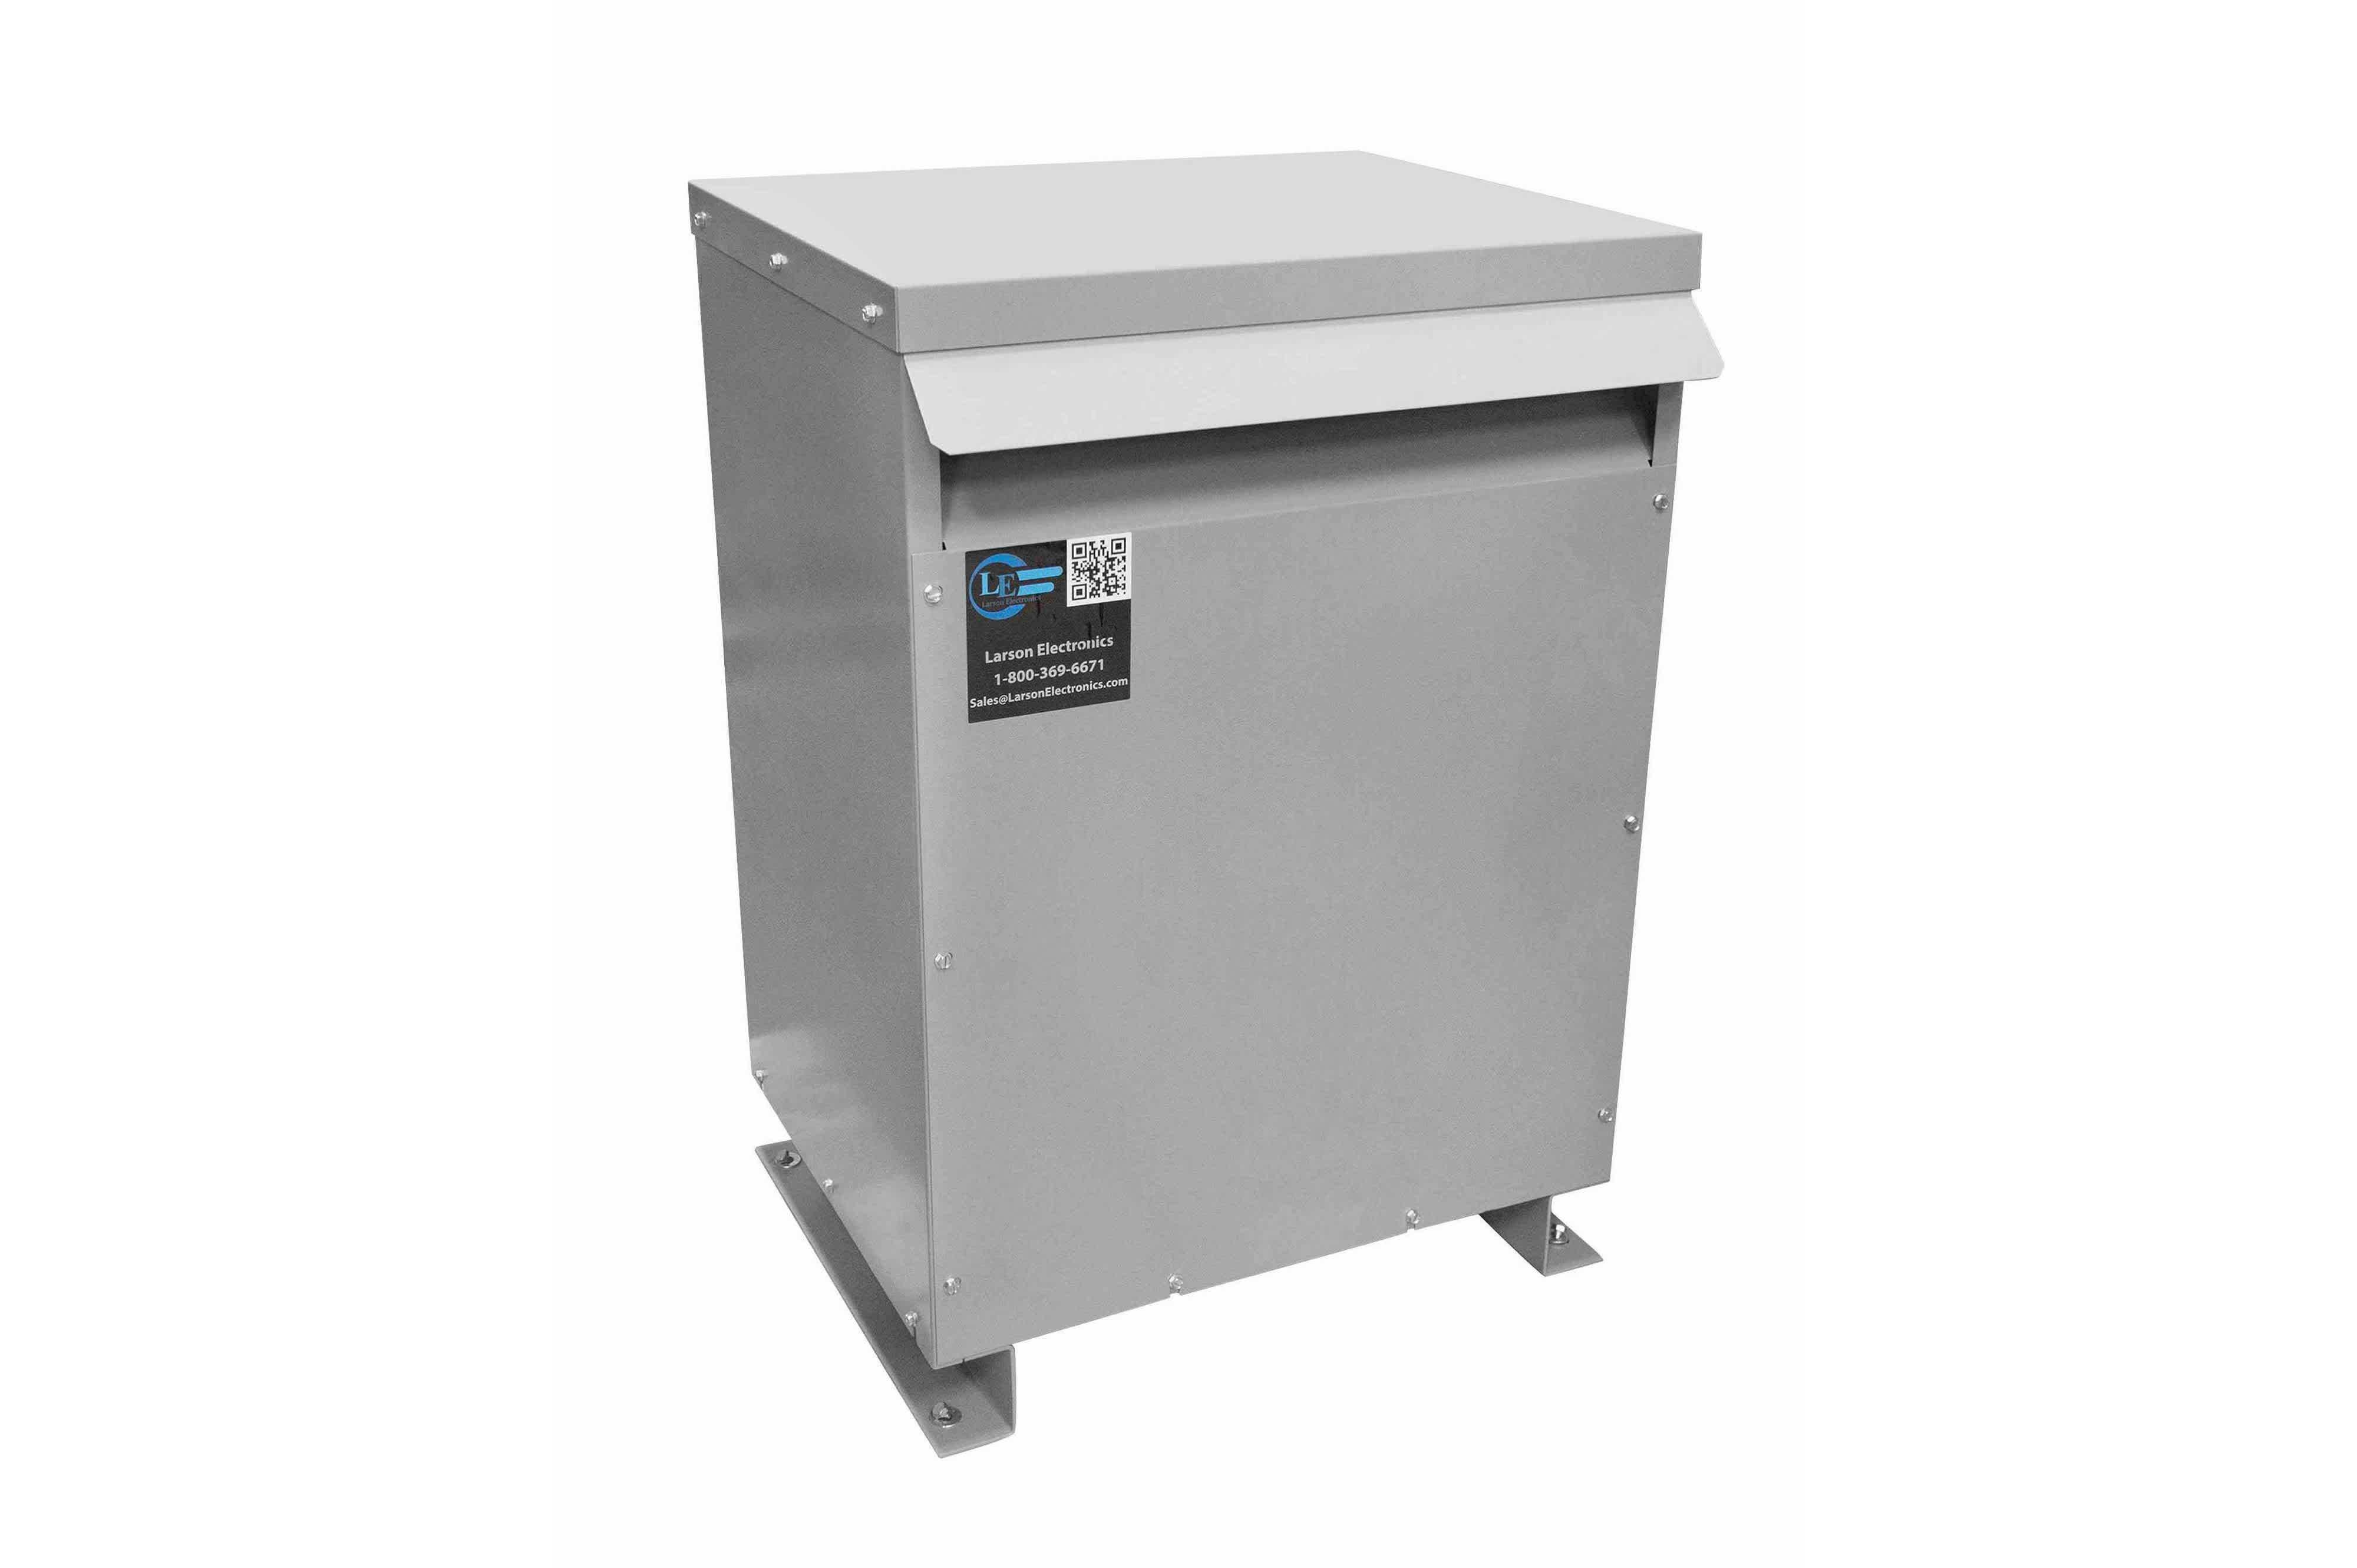 25 kVA 3PH Isolation Transformer, 460V Wye Primary, 380V Delta Secondary, N3R, Ventilated, 60 Hz